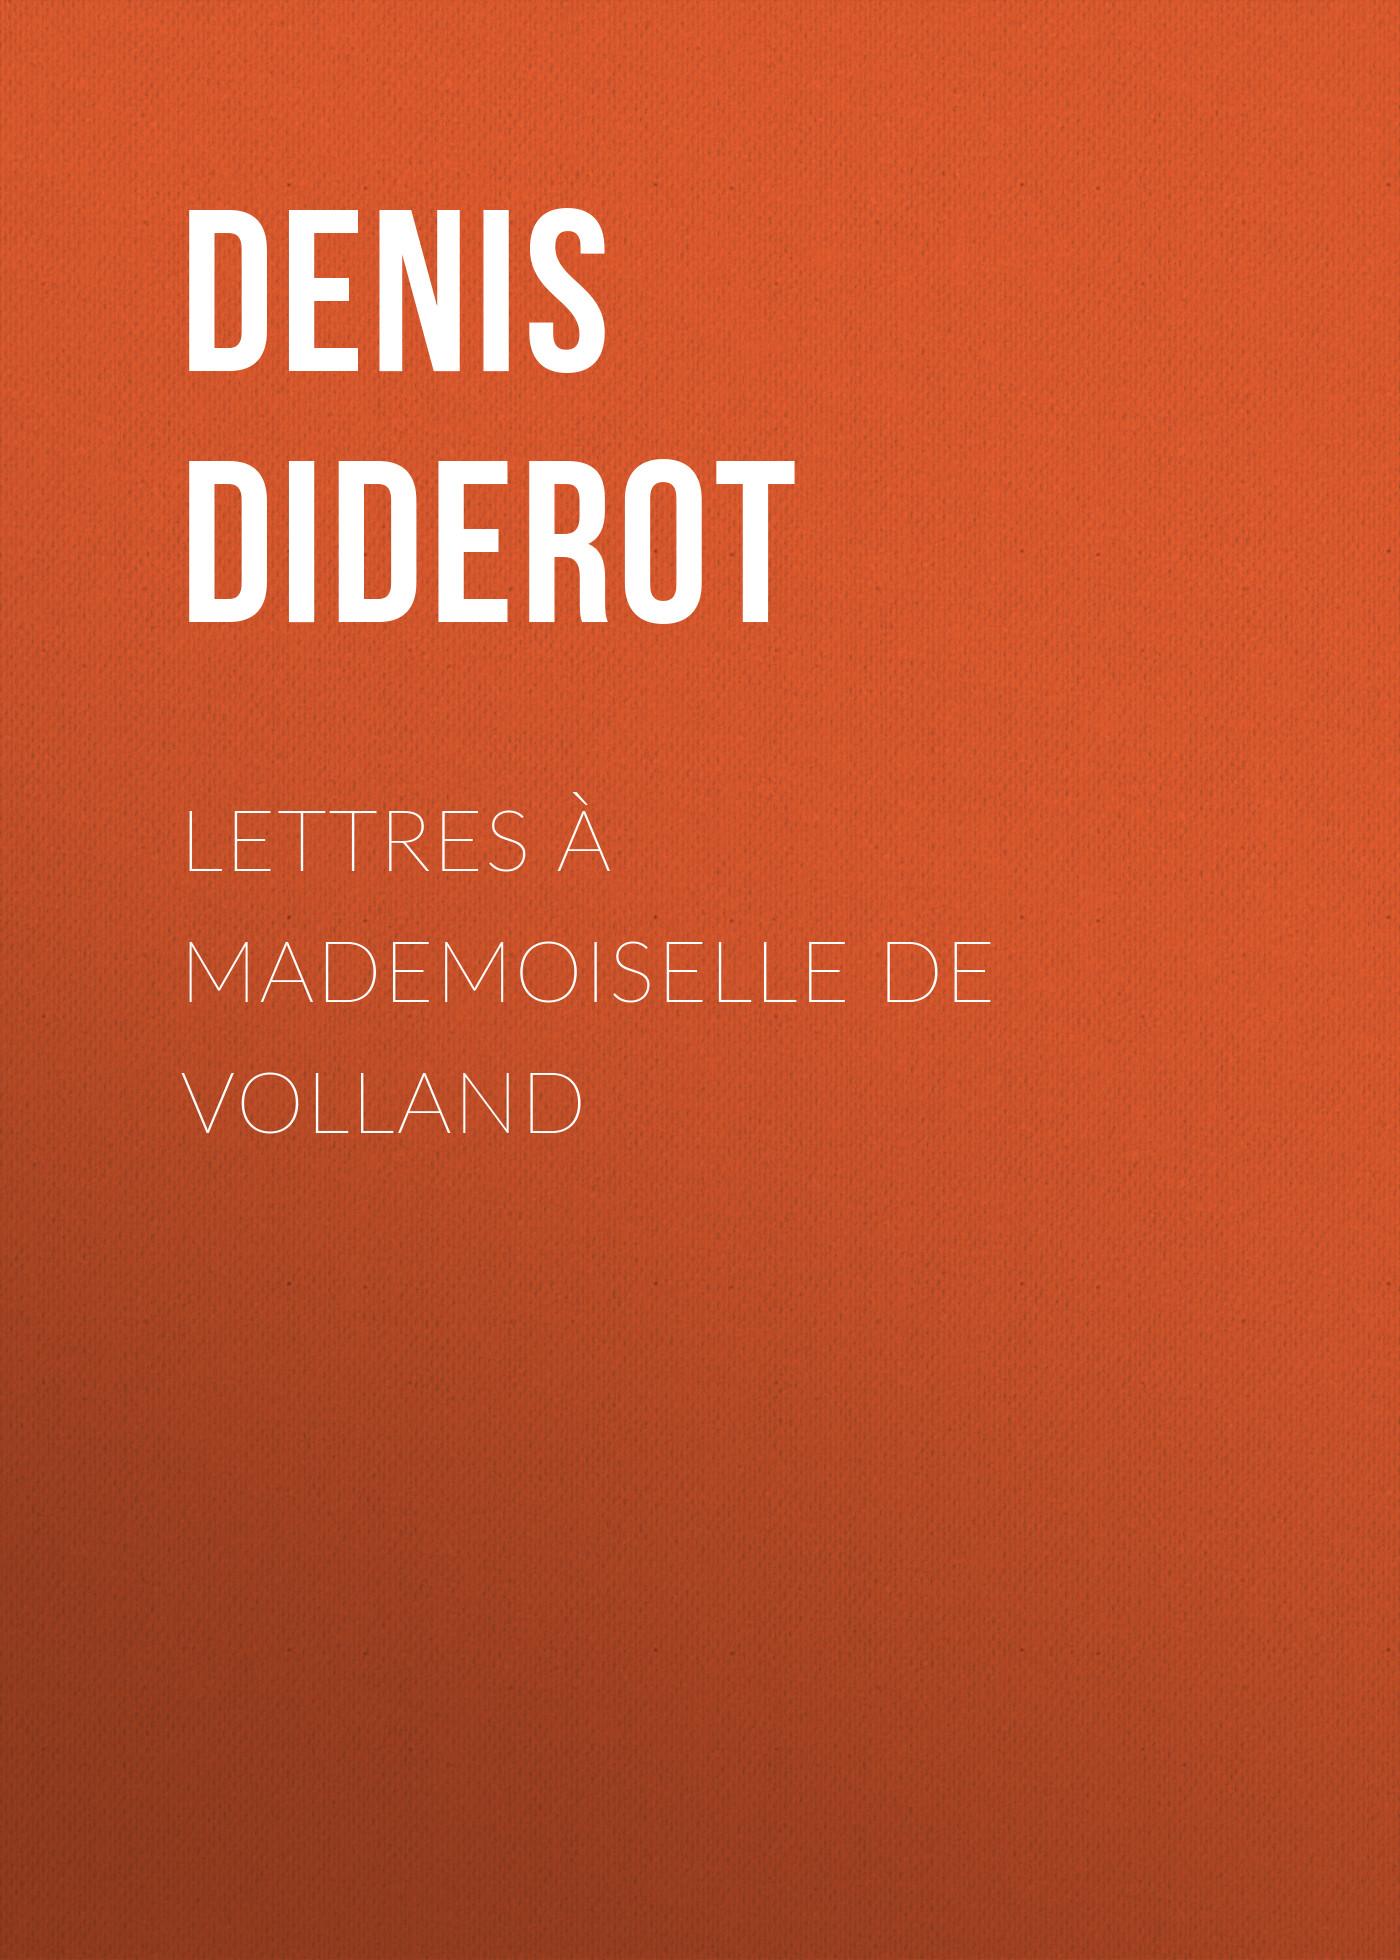 Denis Diderot Lettres à Mademoiselle de Volland цена и фото